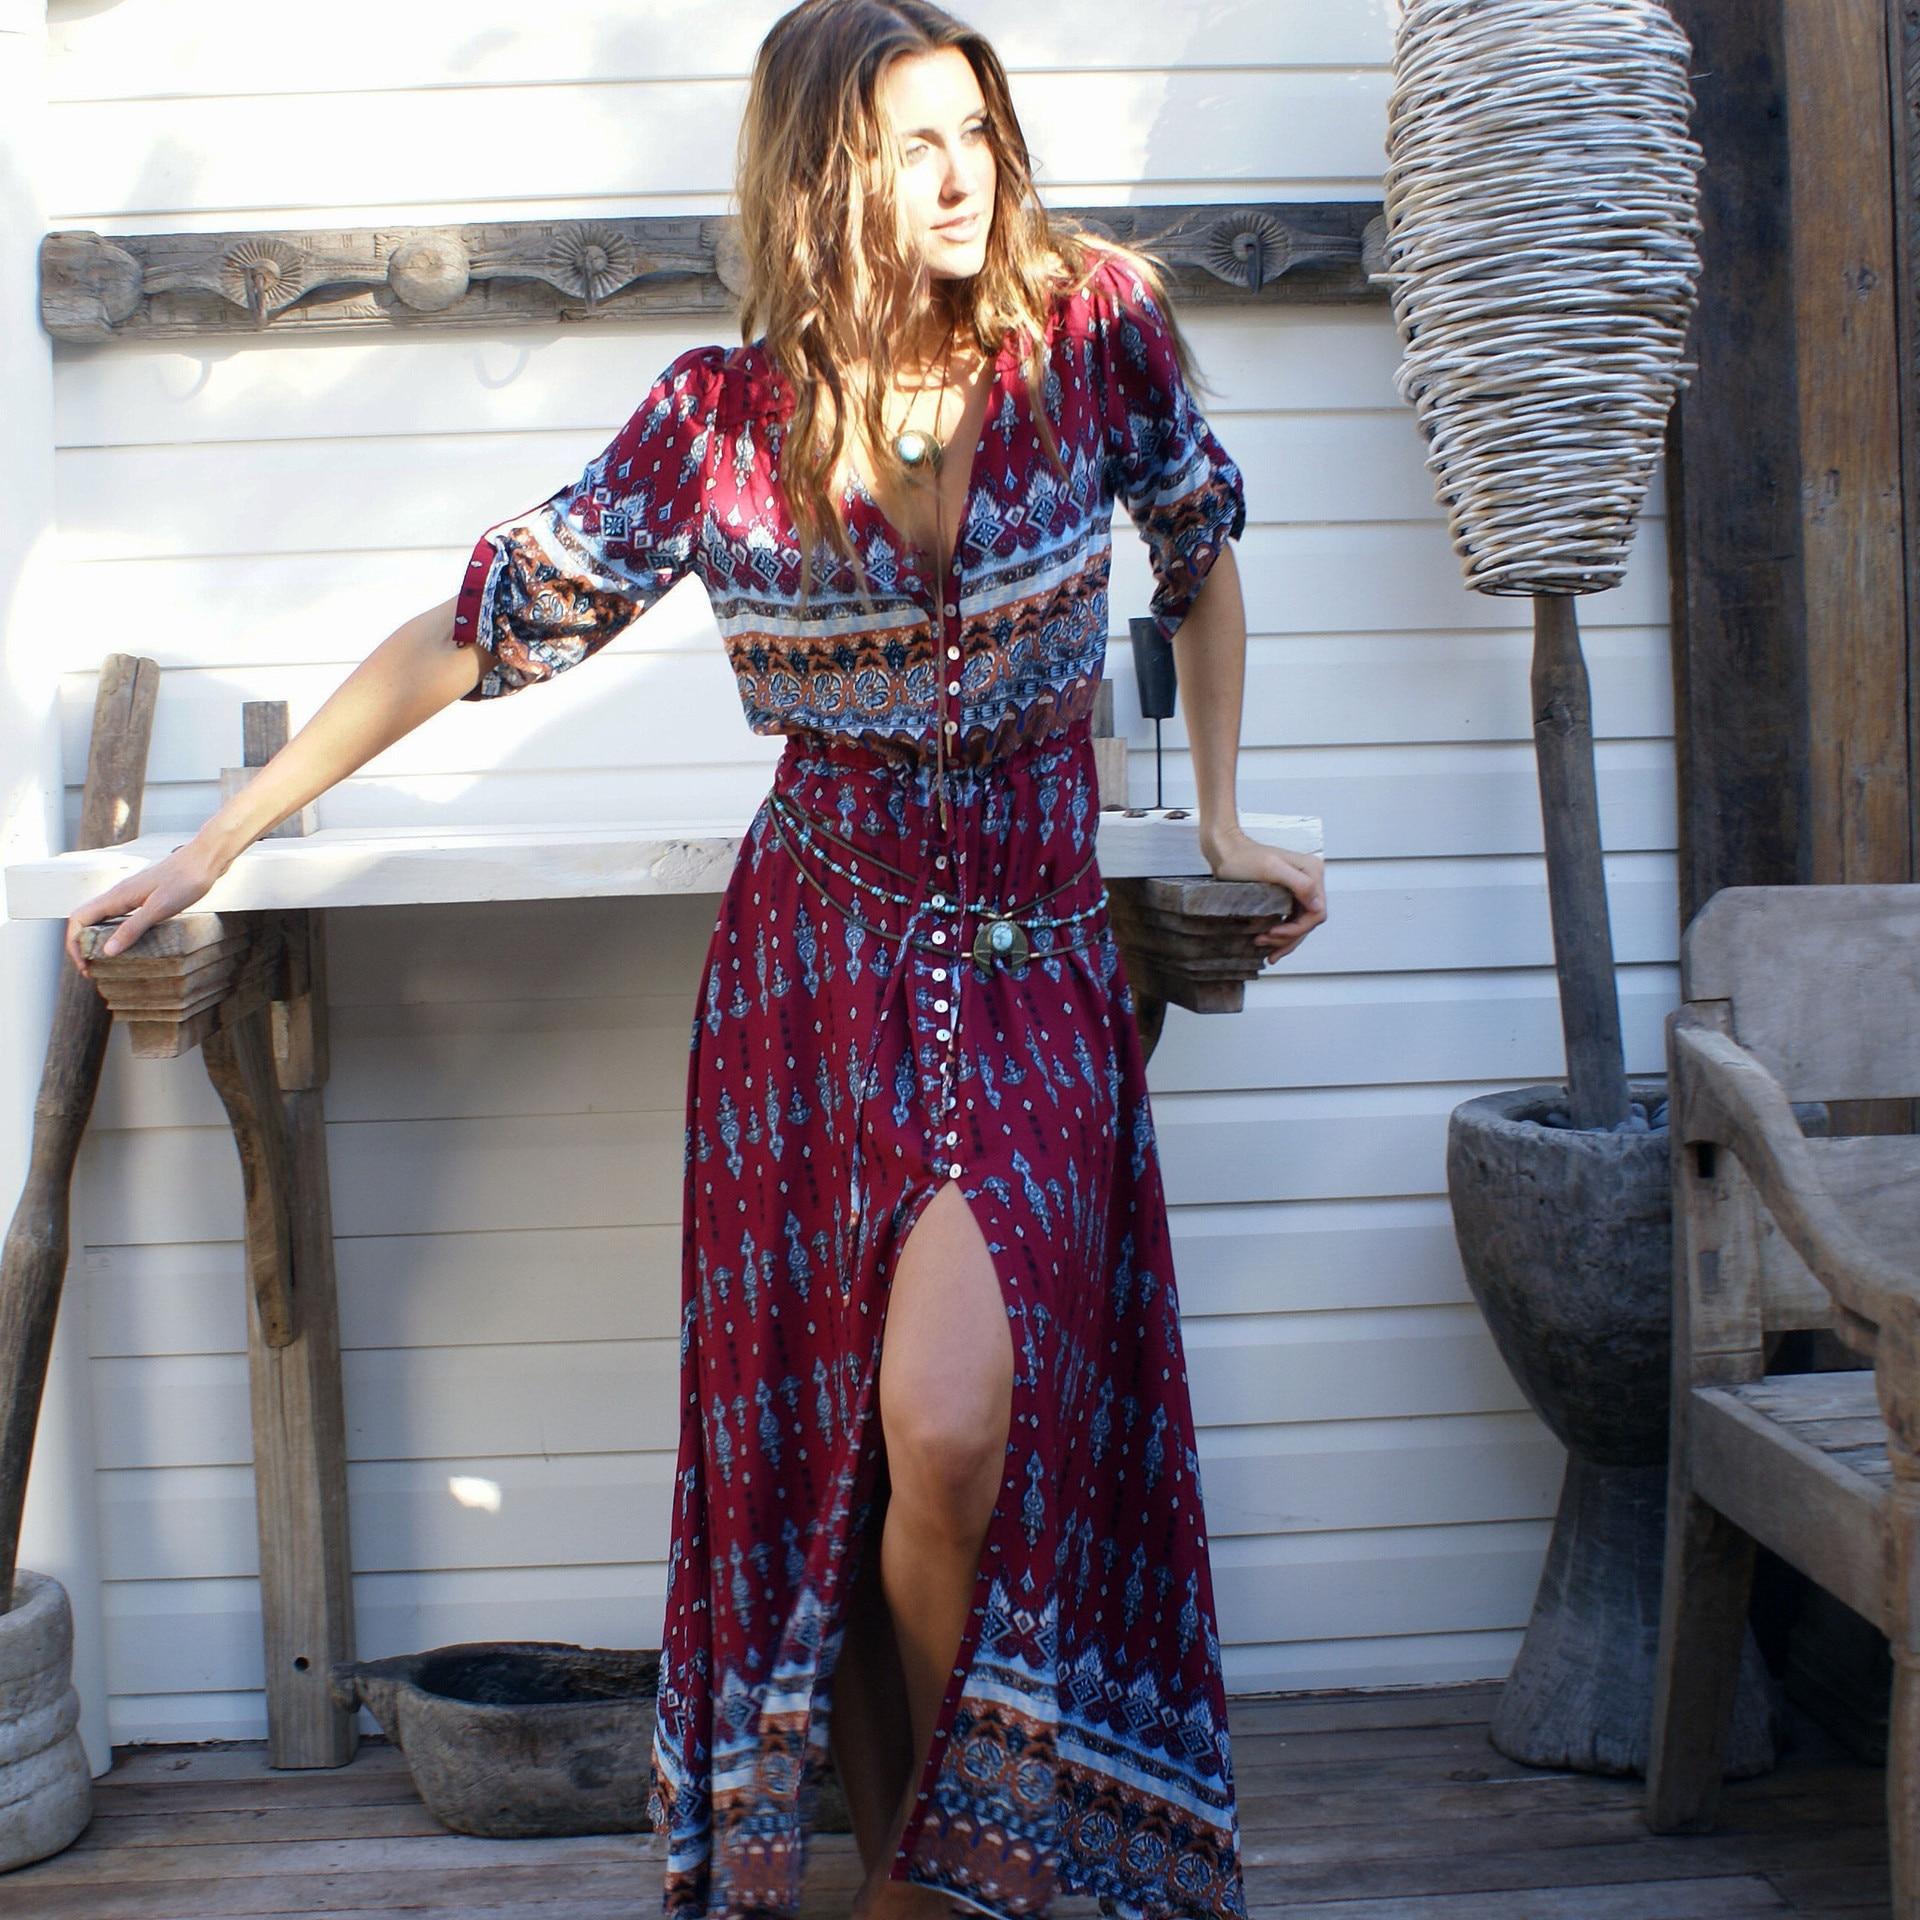 Summer Women Long Boho Dress Long Maxi Dresses Ethnic Beach Dresses Multicolor Bohemian Floral Printed Dresses